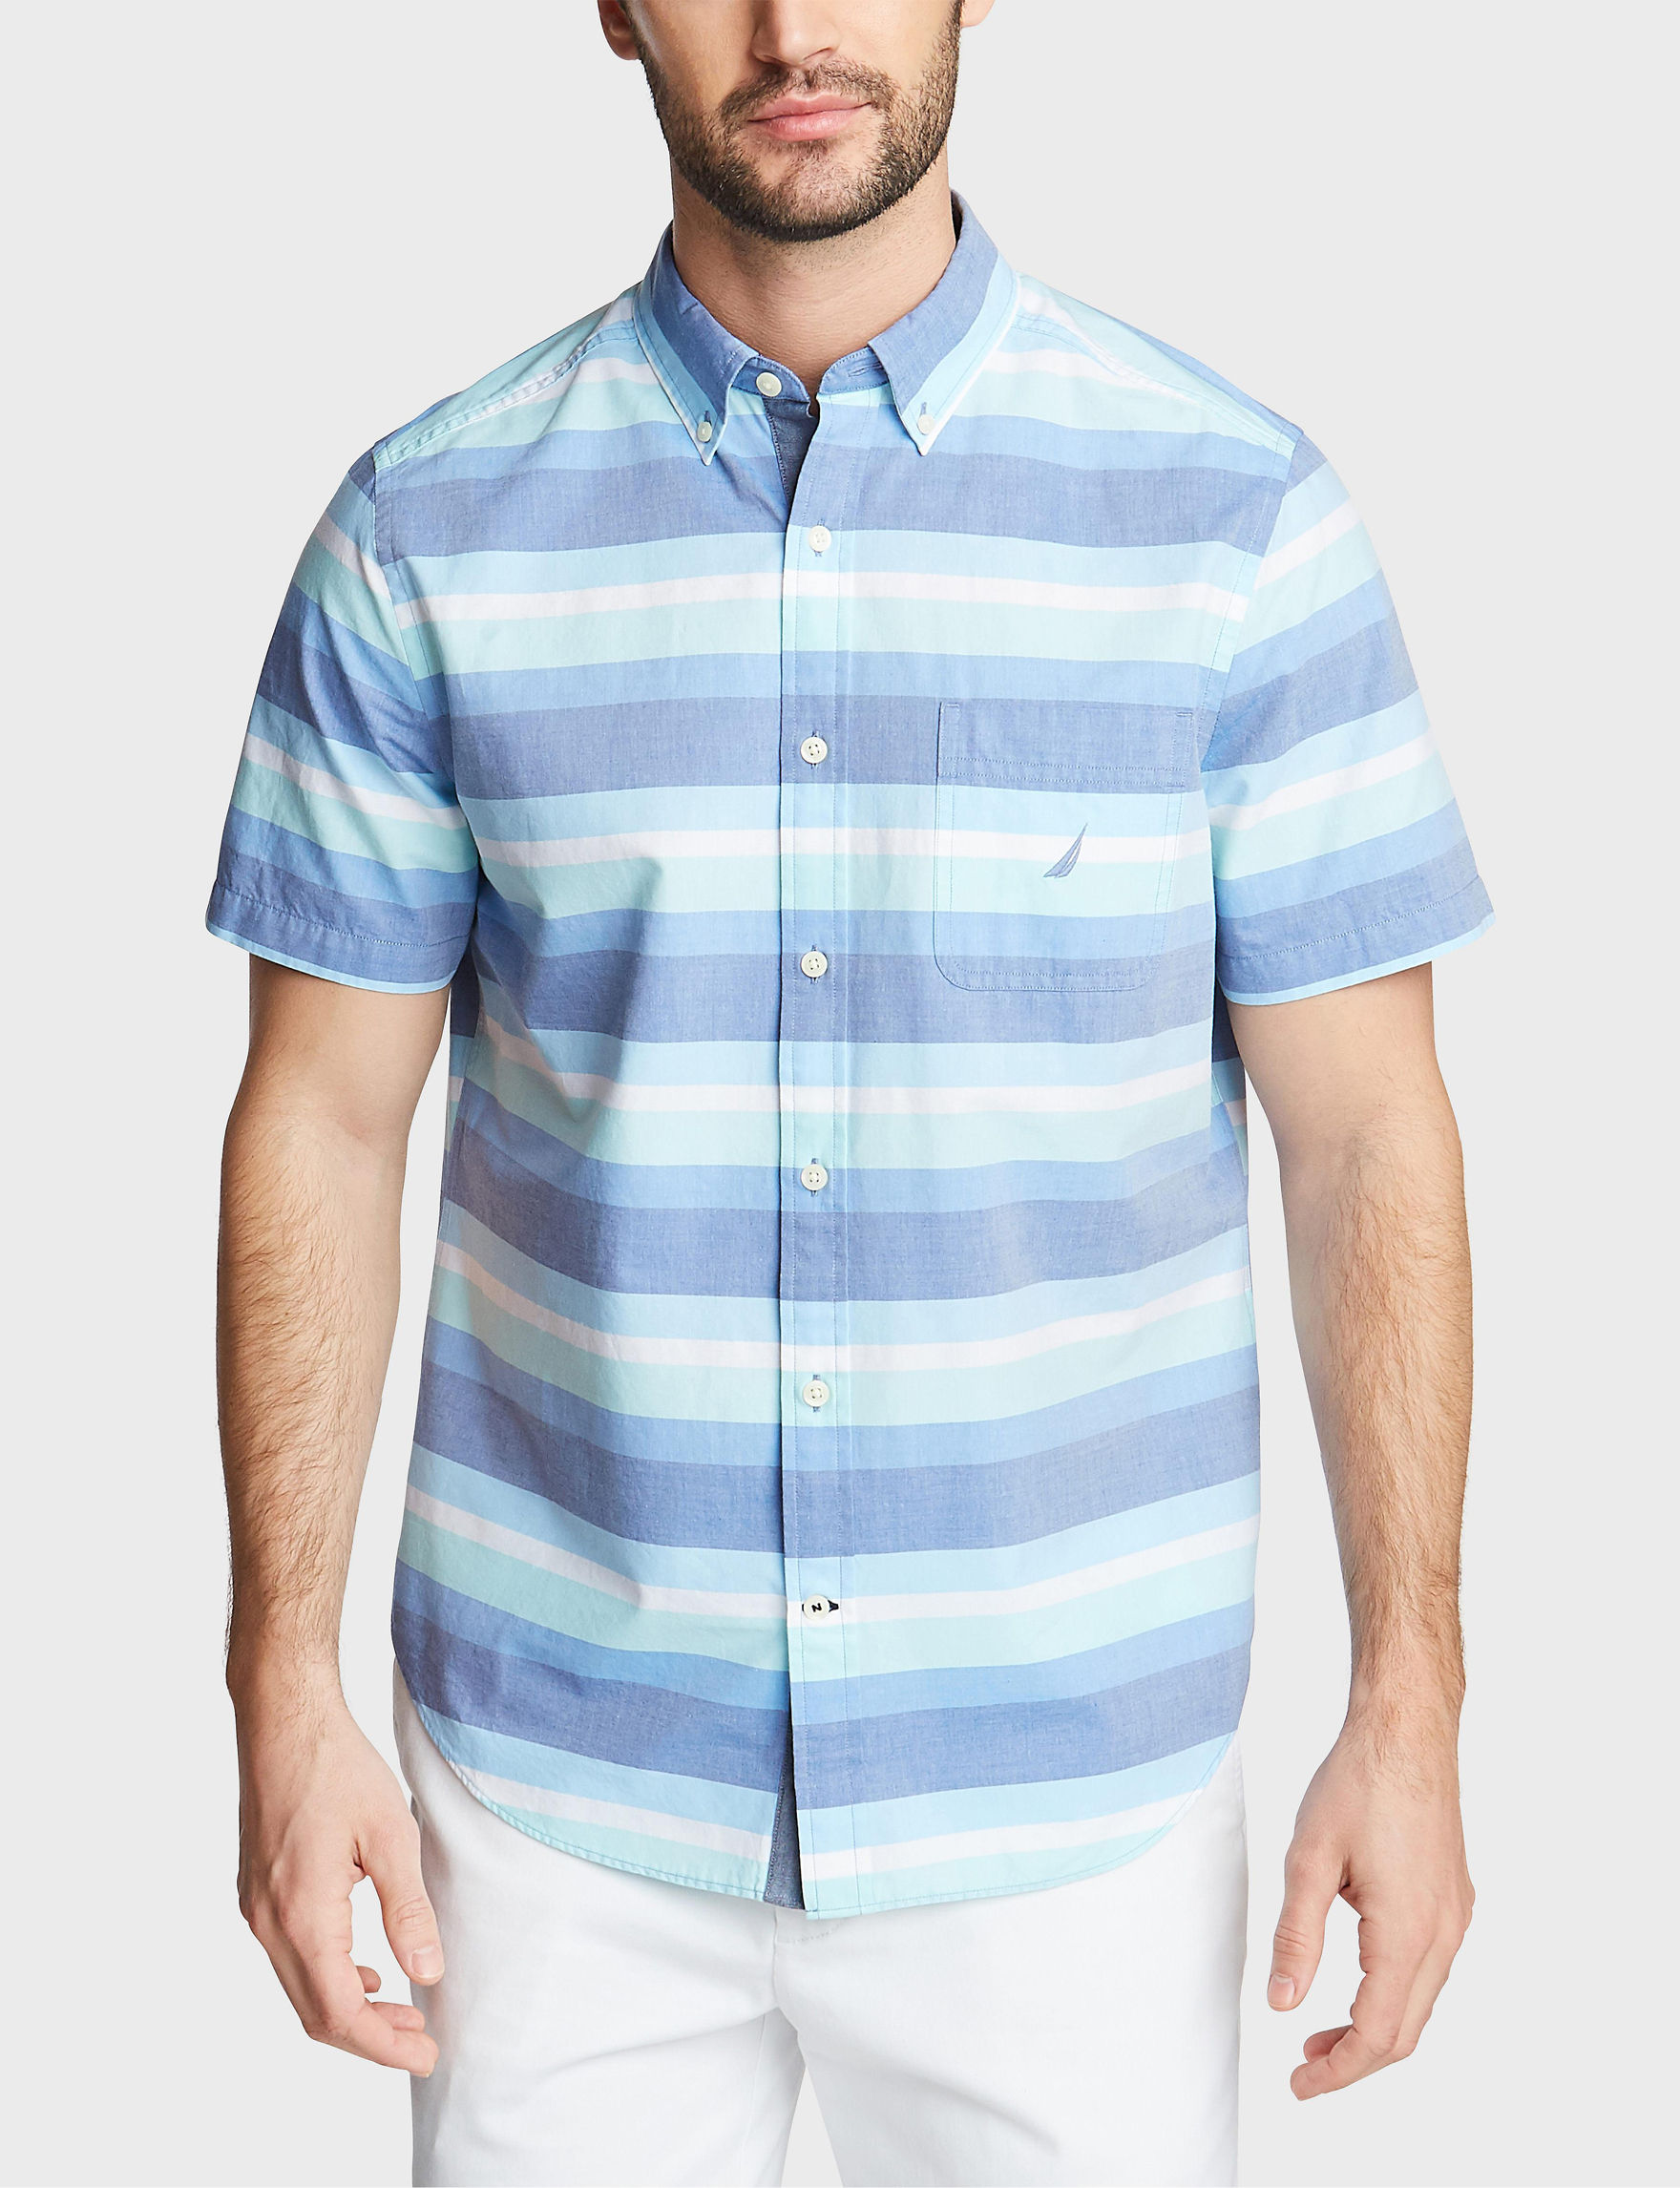 Nautica True Blue Casual Button Down Shirts